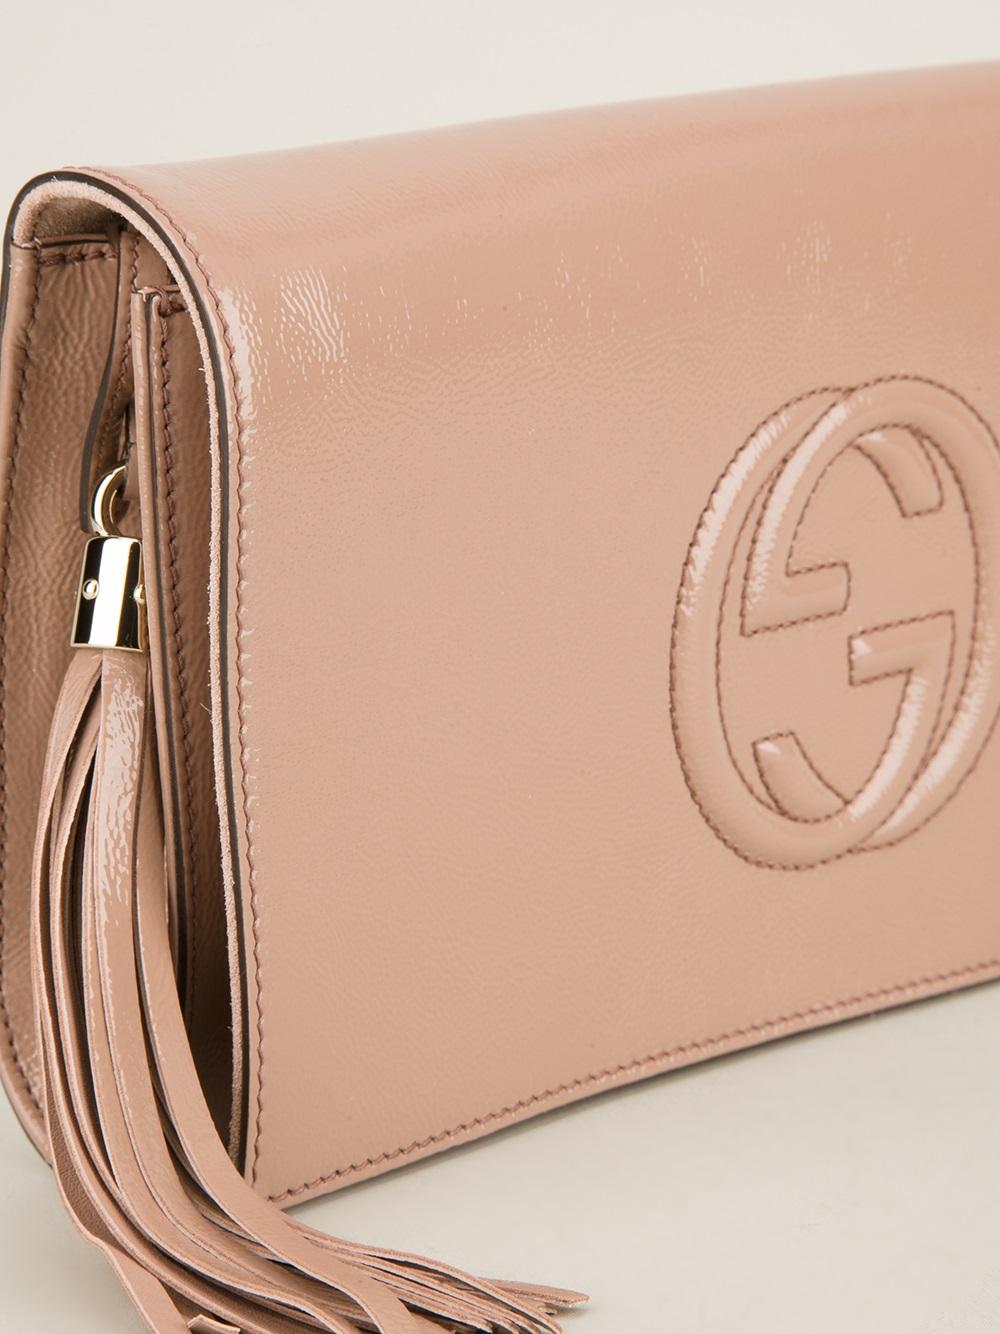 Lyst - Gucci Soho Clutch in Pink